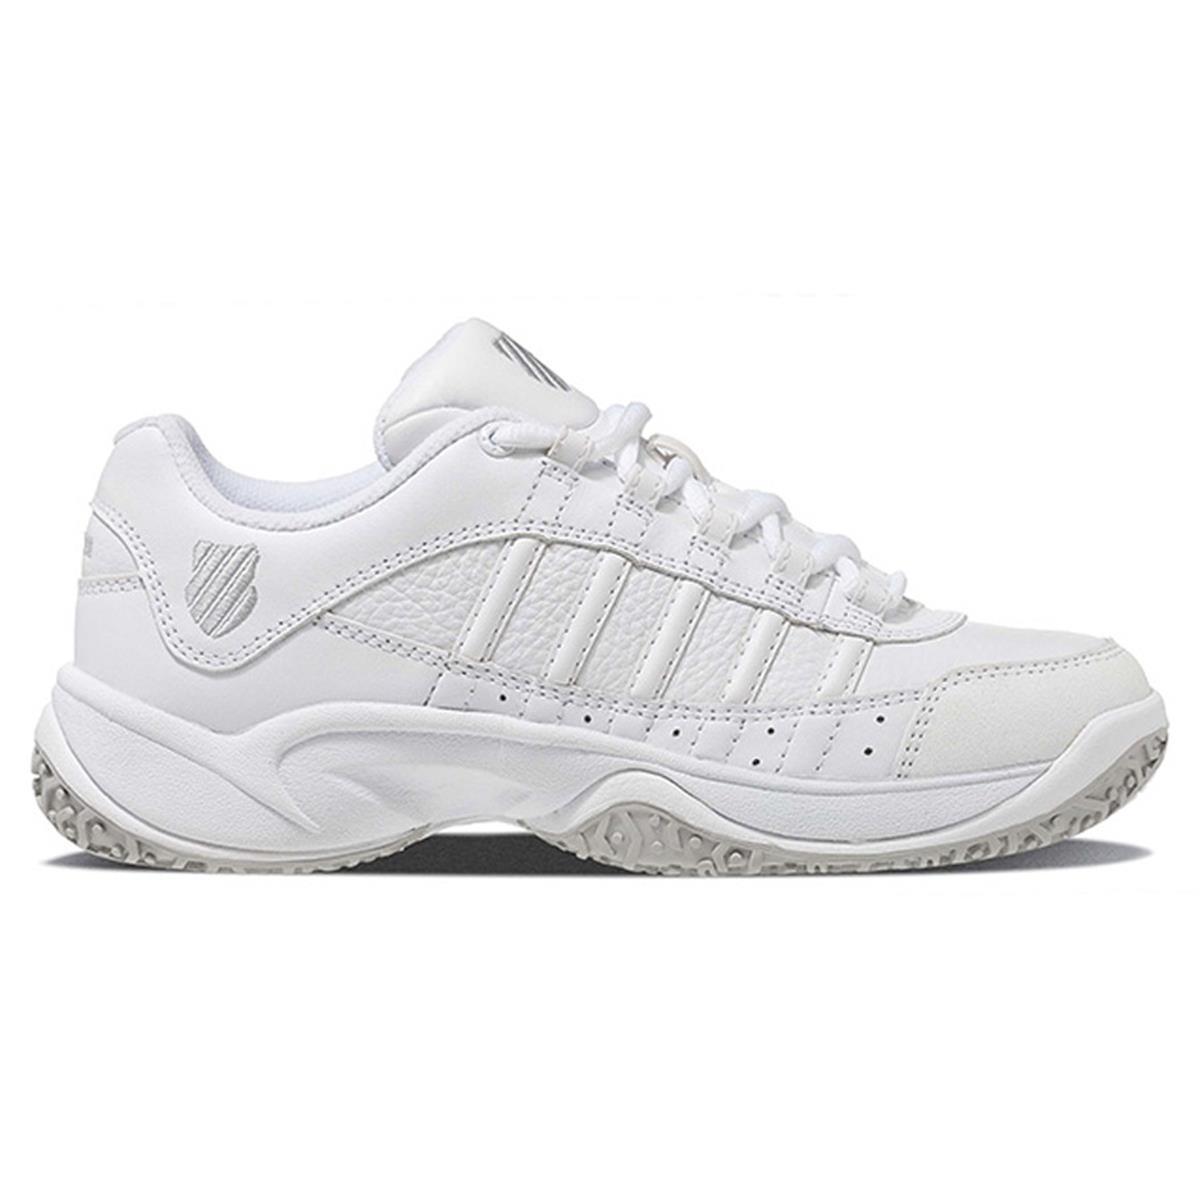 K Swiss Ladies Tennis Shoes Uk